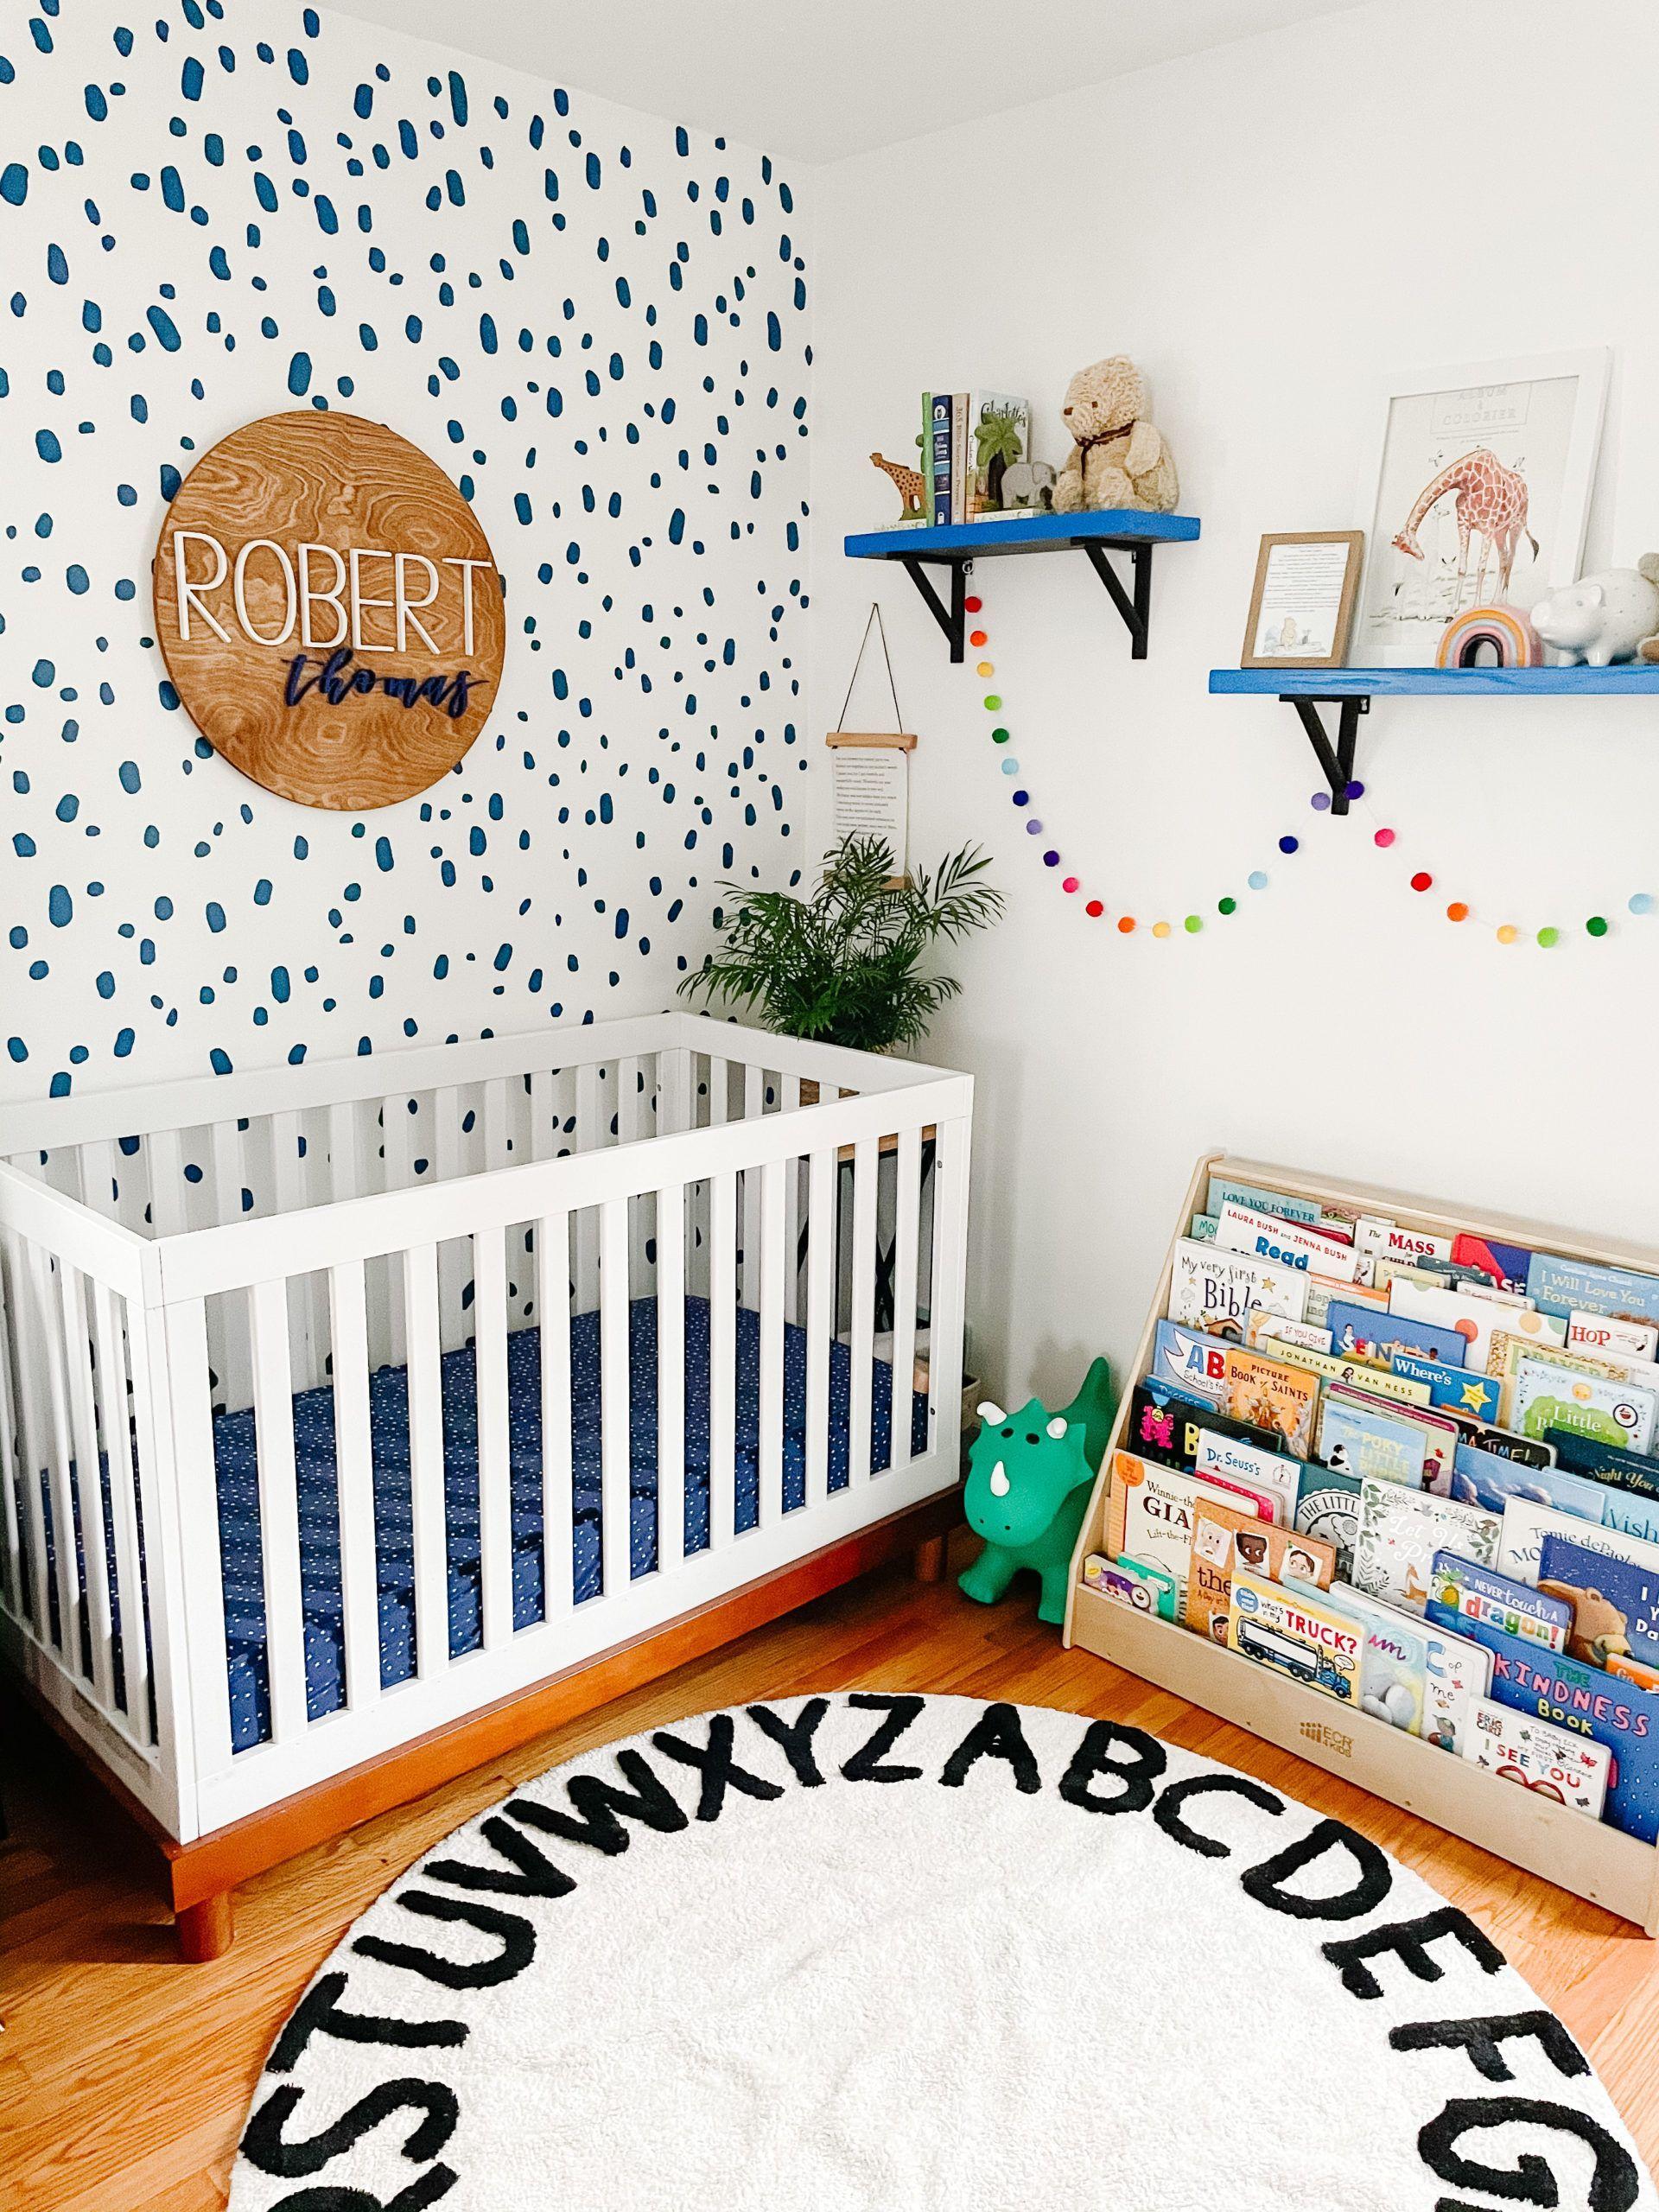 Farmhouse Bedroom Decor Leaves Boho Custom Play Mat Kids Room Rugs Rustic Playroom Rug Personalized Round Rug Customized Nursery Carpet